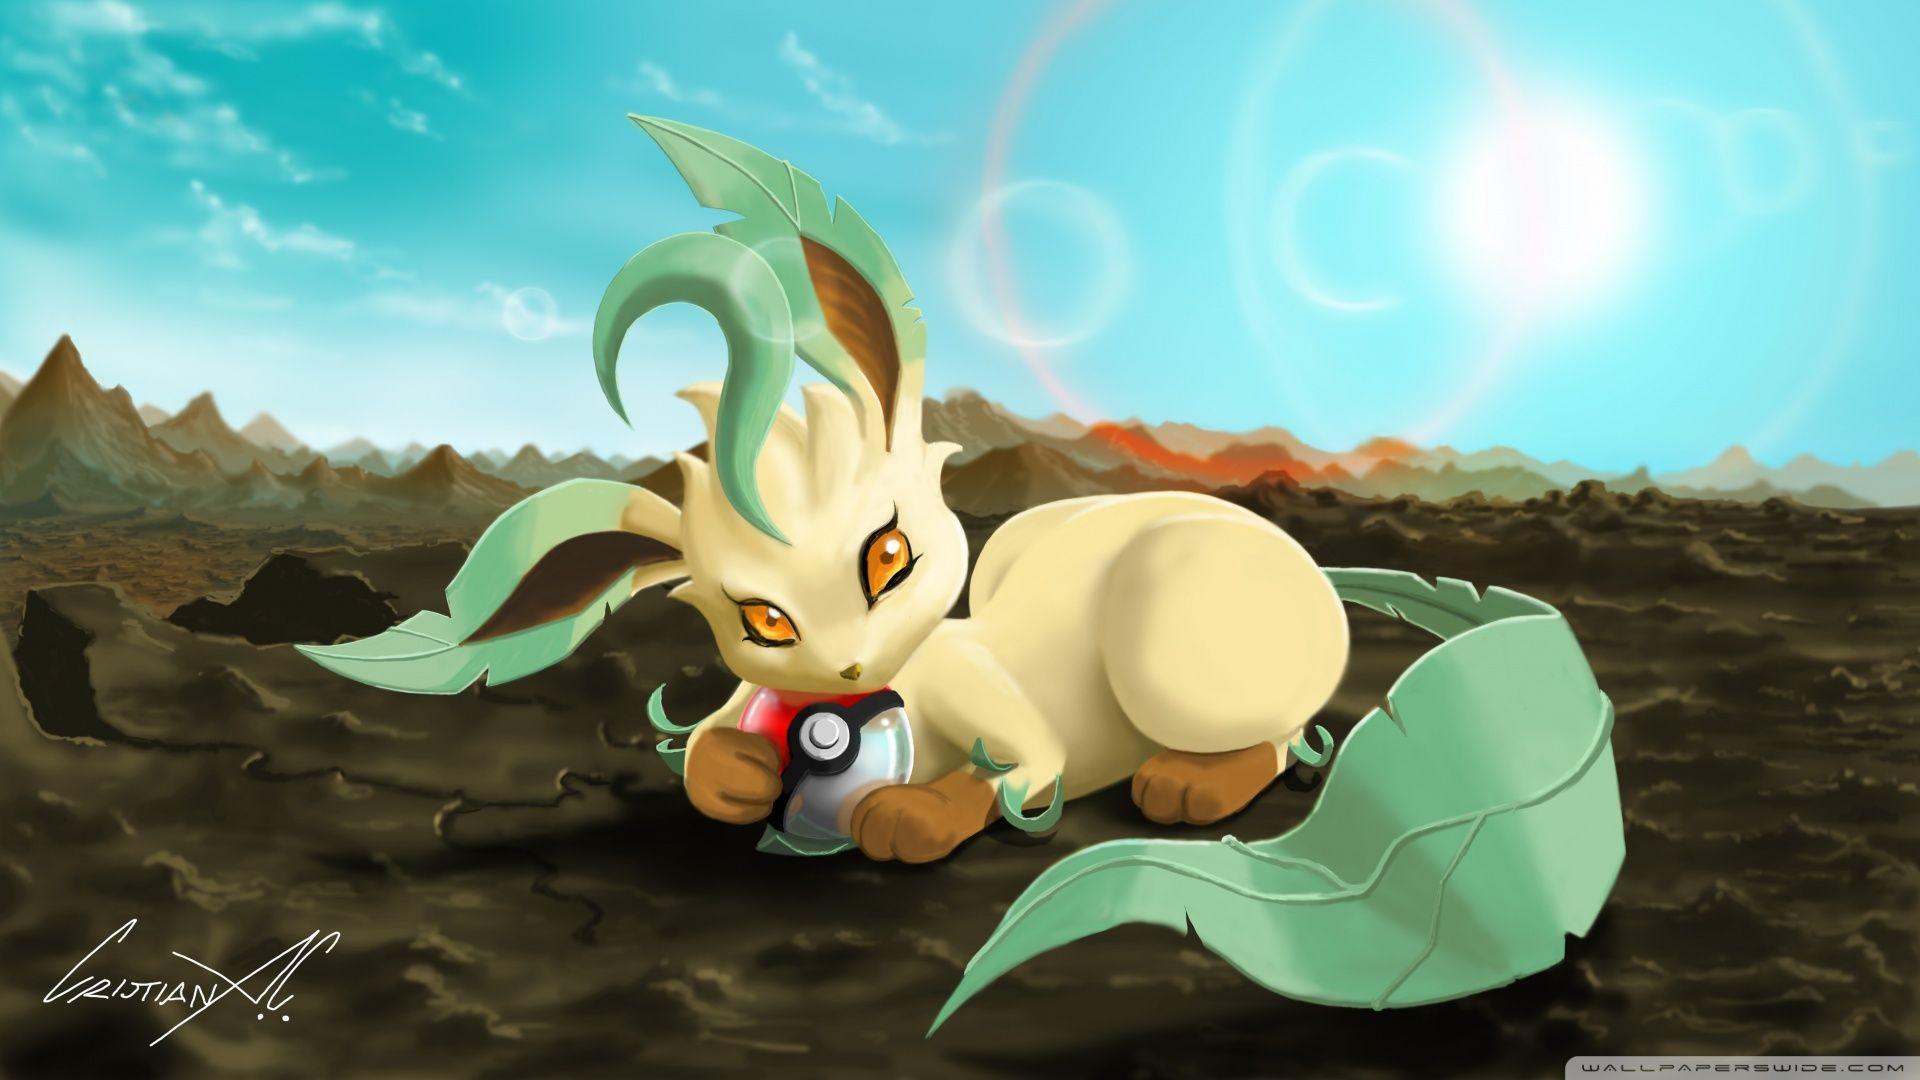 Pokemon Hd Wallpapers Top Free Pokemon Hd Backgrounds